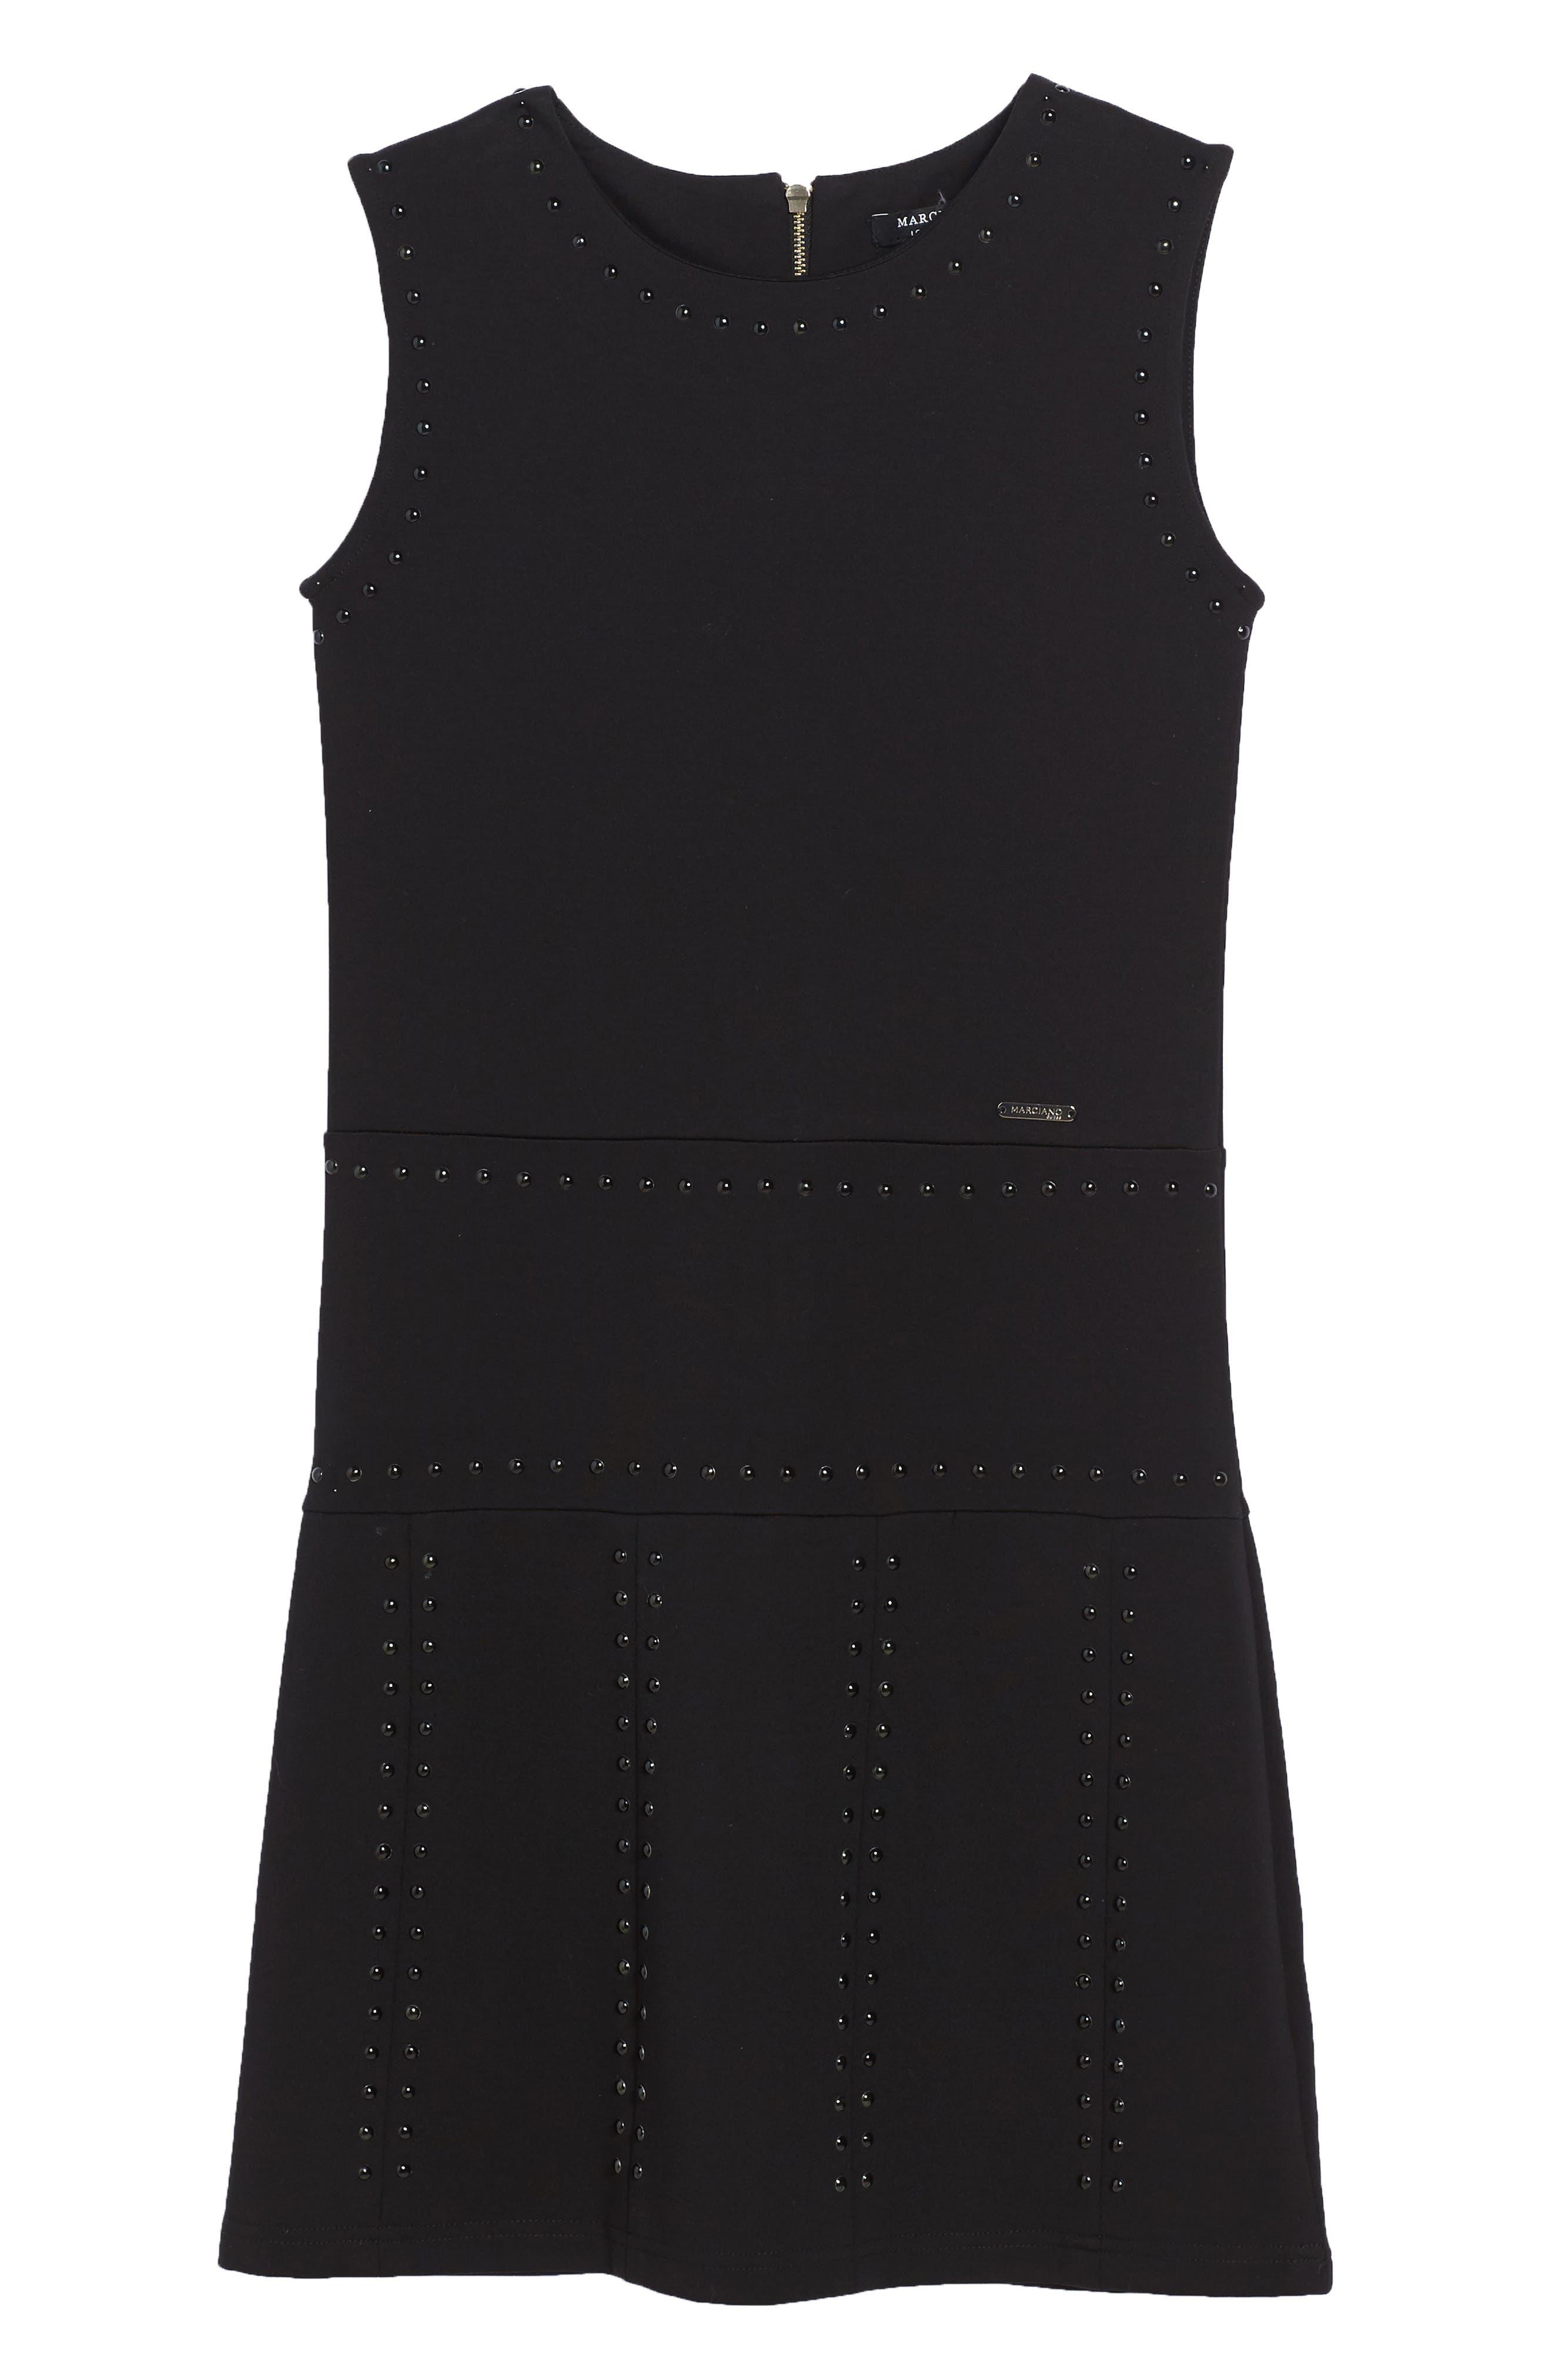 Studded Sleeveless Dress,                             Main thumbnail 1, color,                             001